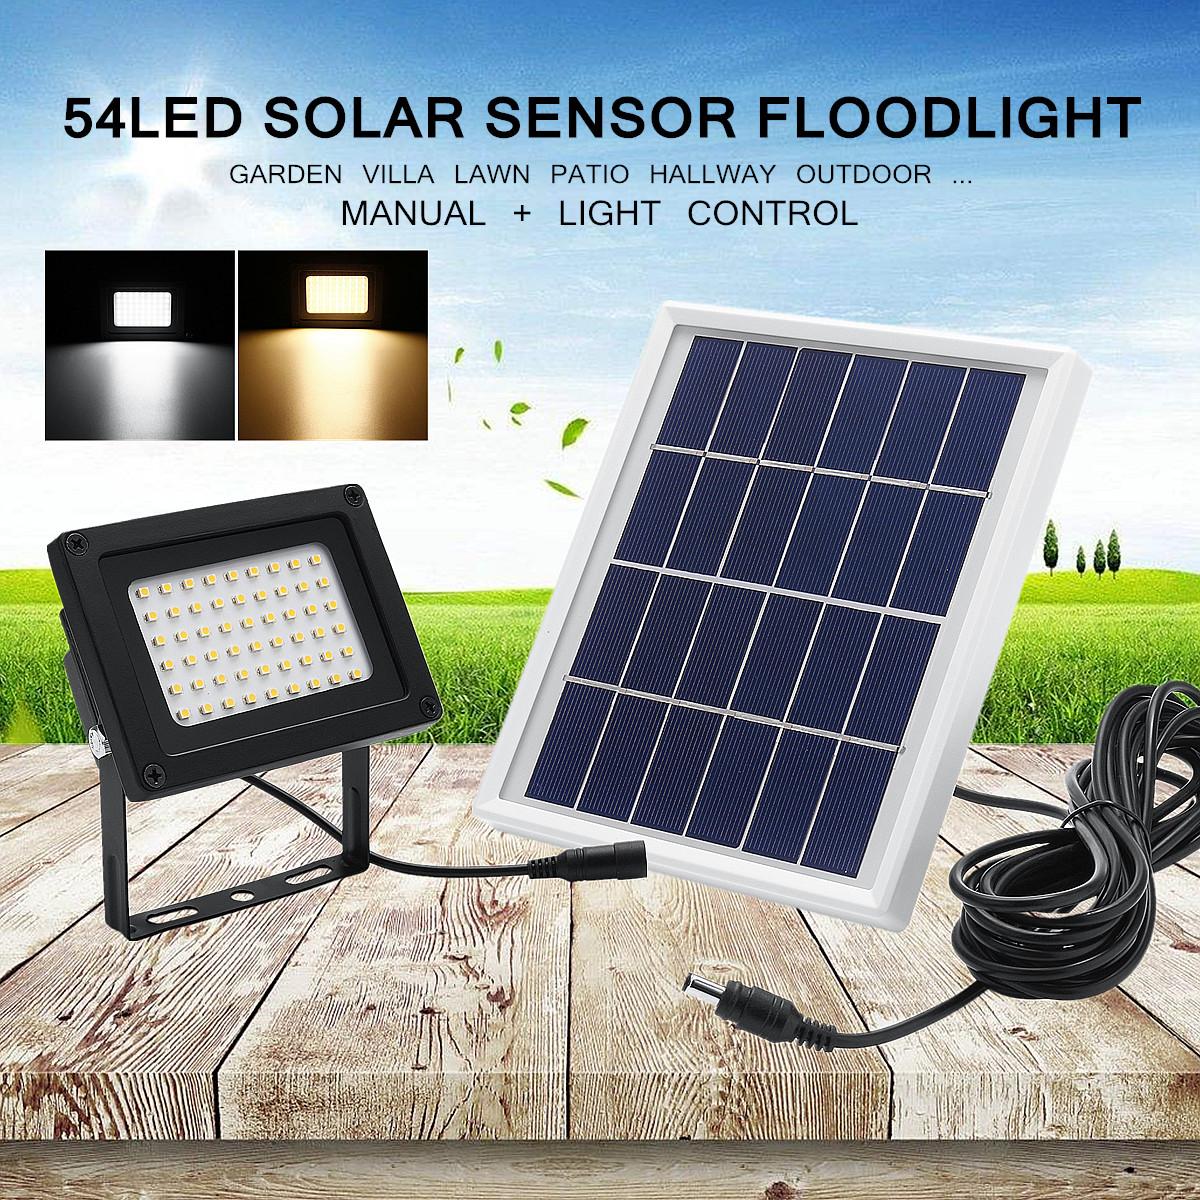 54 LED Super Bright Solar Powered Lamp + Solar Panel Flood Light Spot Lamp Dusk-to-Dawn Sensor Waterproof